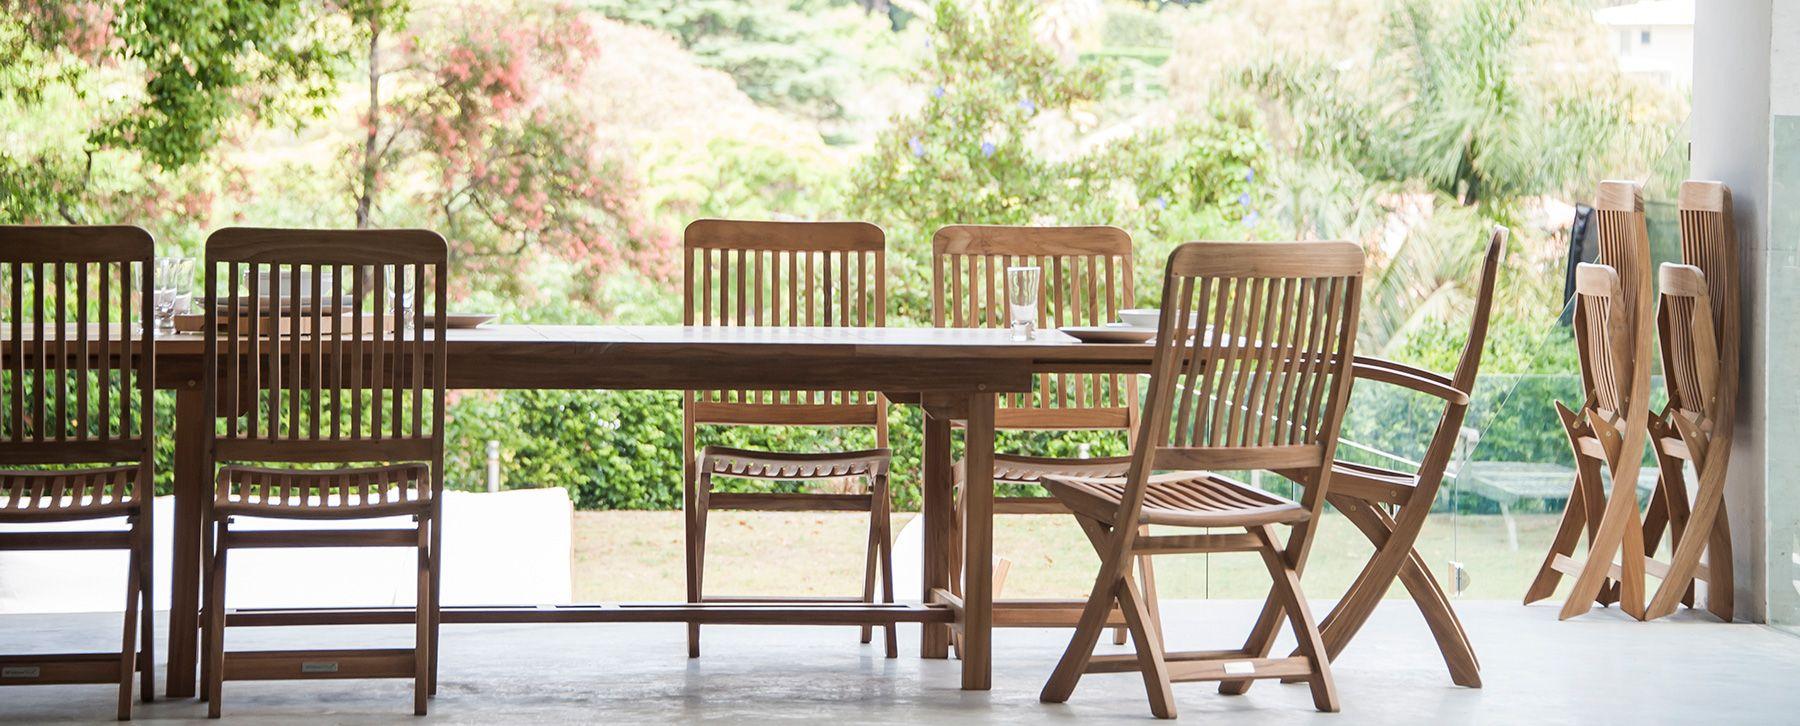 Bridgehampton dining chair stellar couture outdoor for Traditional garden furniture